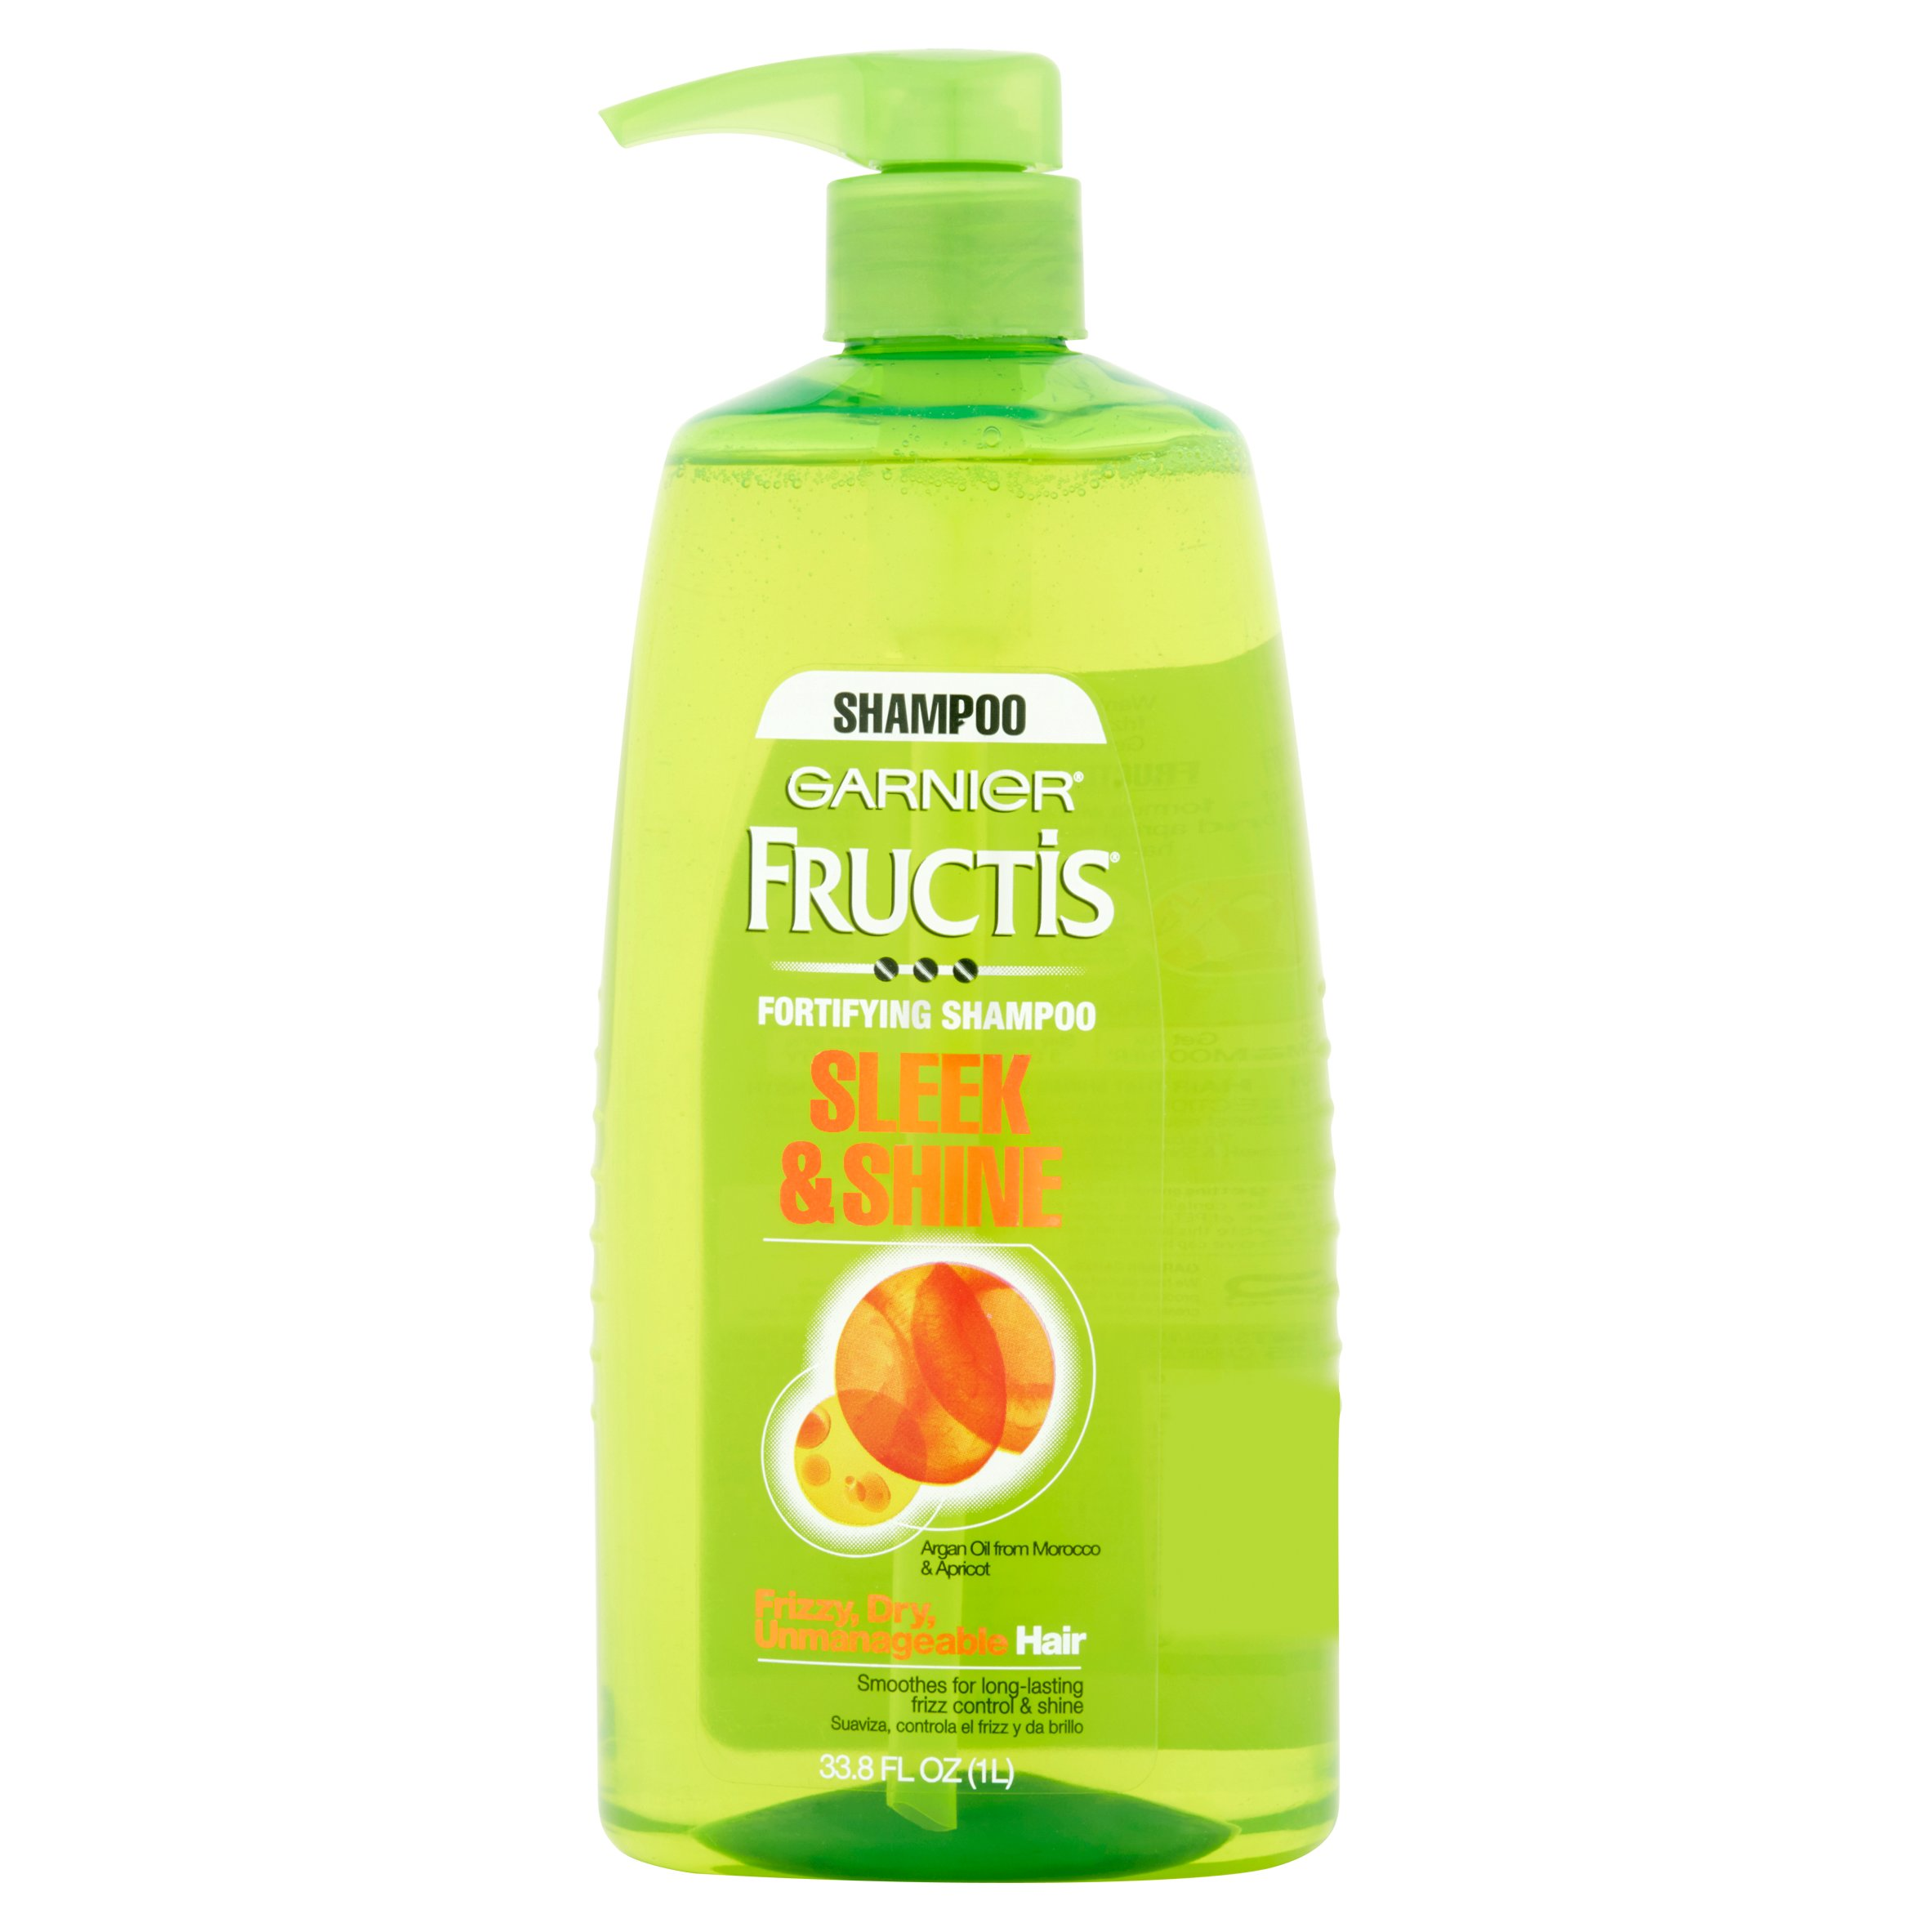 Garnier Fructis Sleek & Shine Fortifying Shampoo, 33.8 fl oz